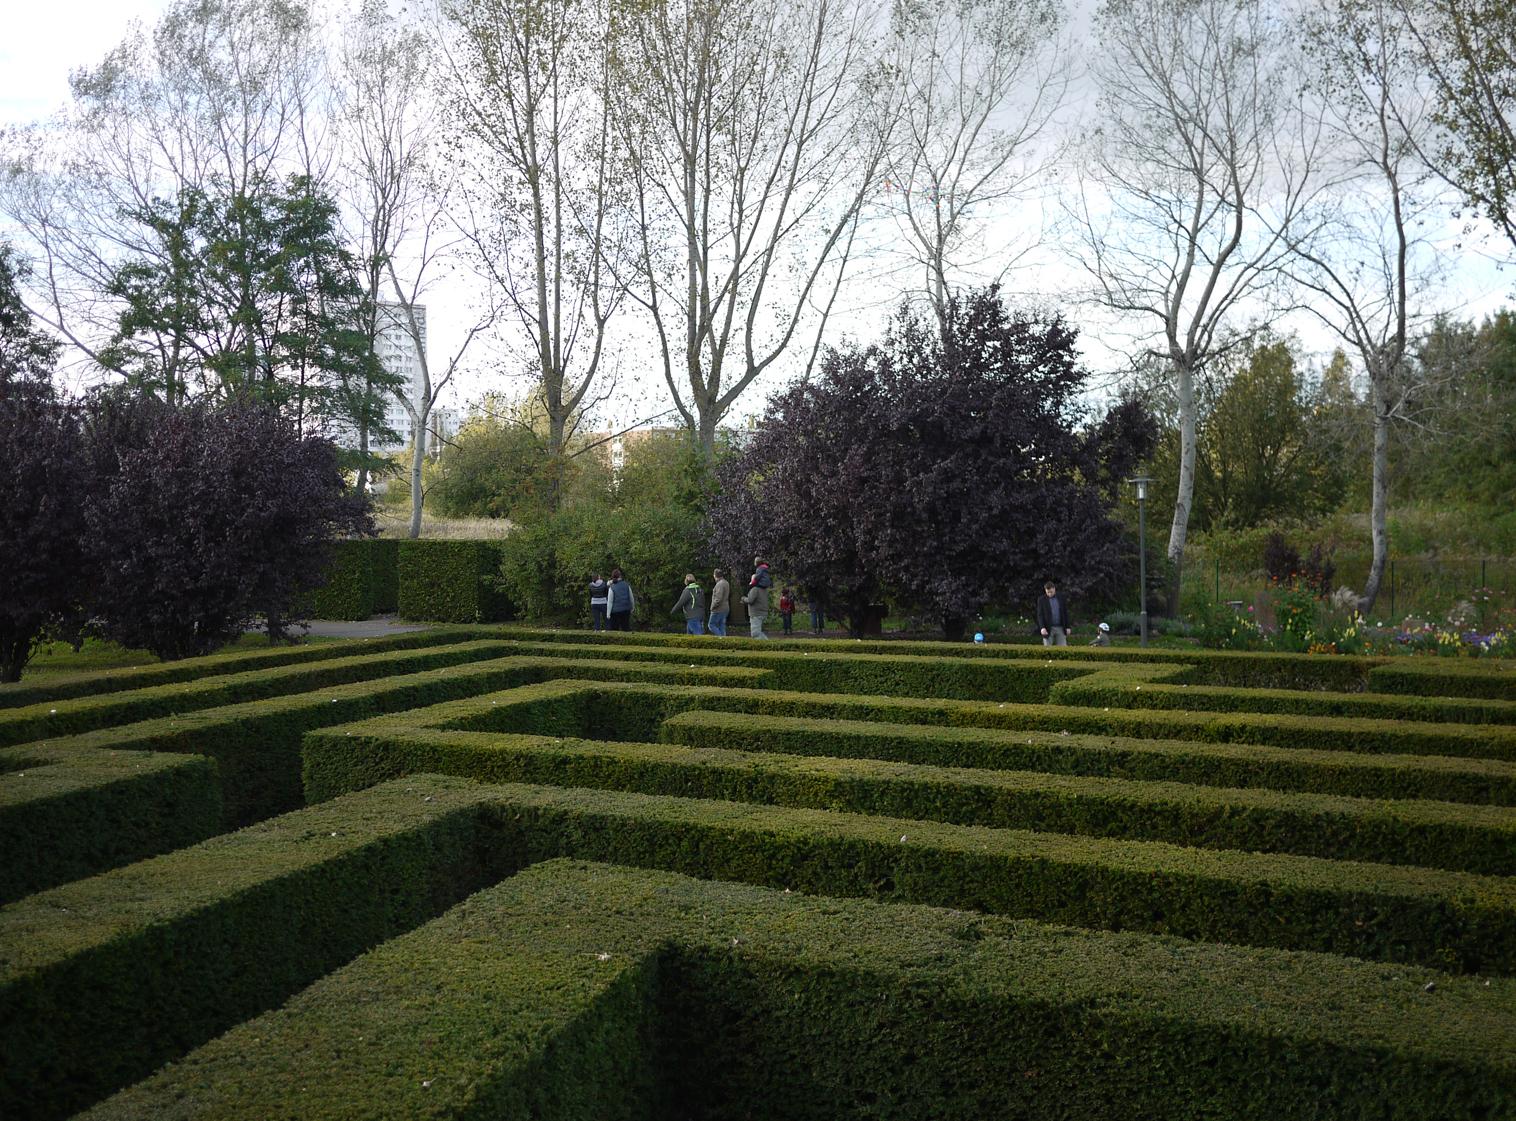 gardens of the world4 original - Gardens Of The World Berlin Cost